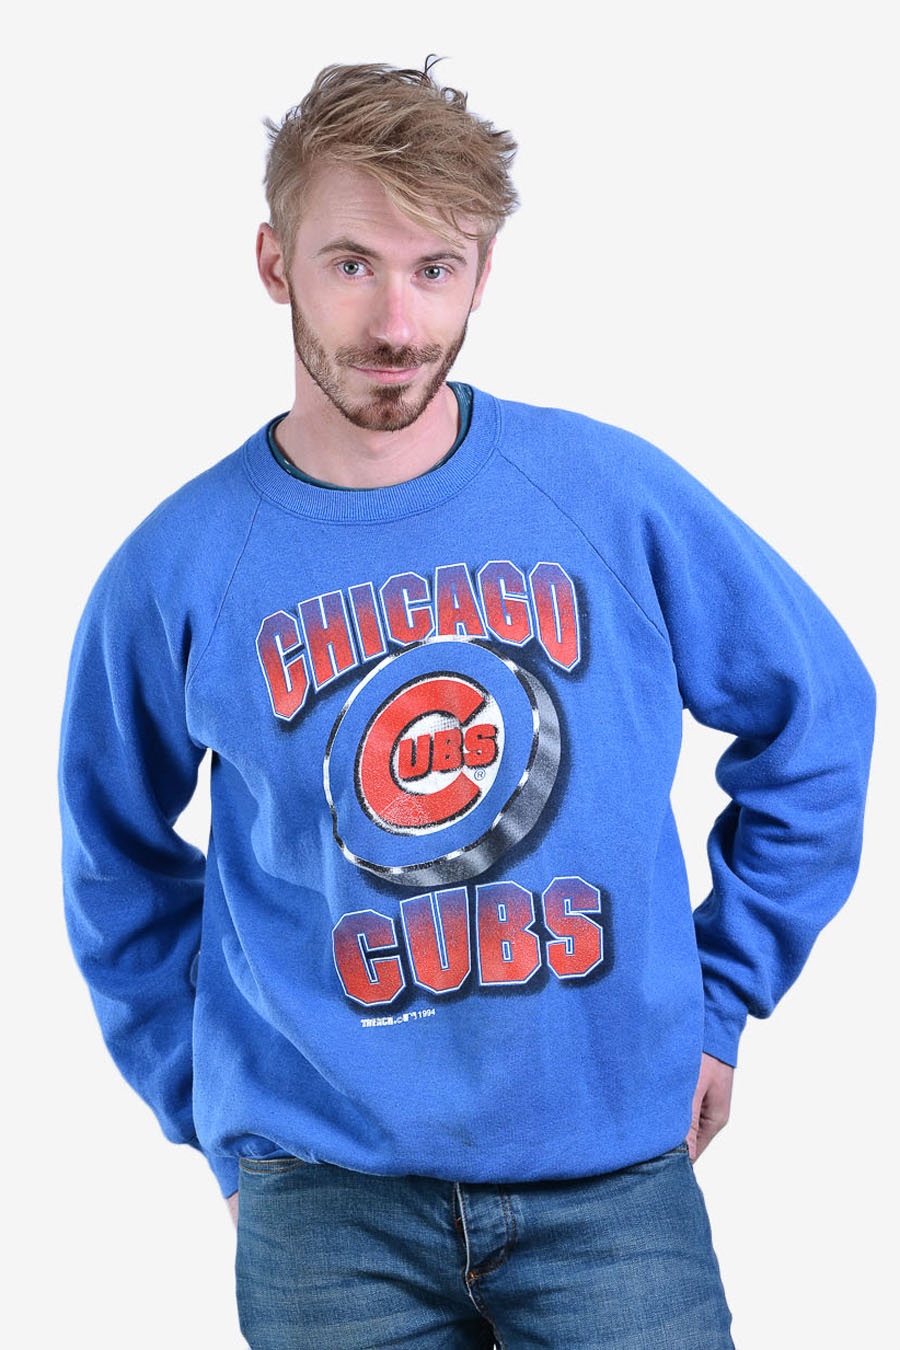 Vintage Chigago Cubs sweatshirt